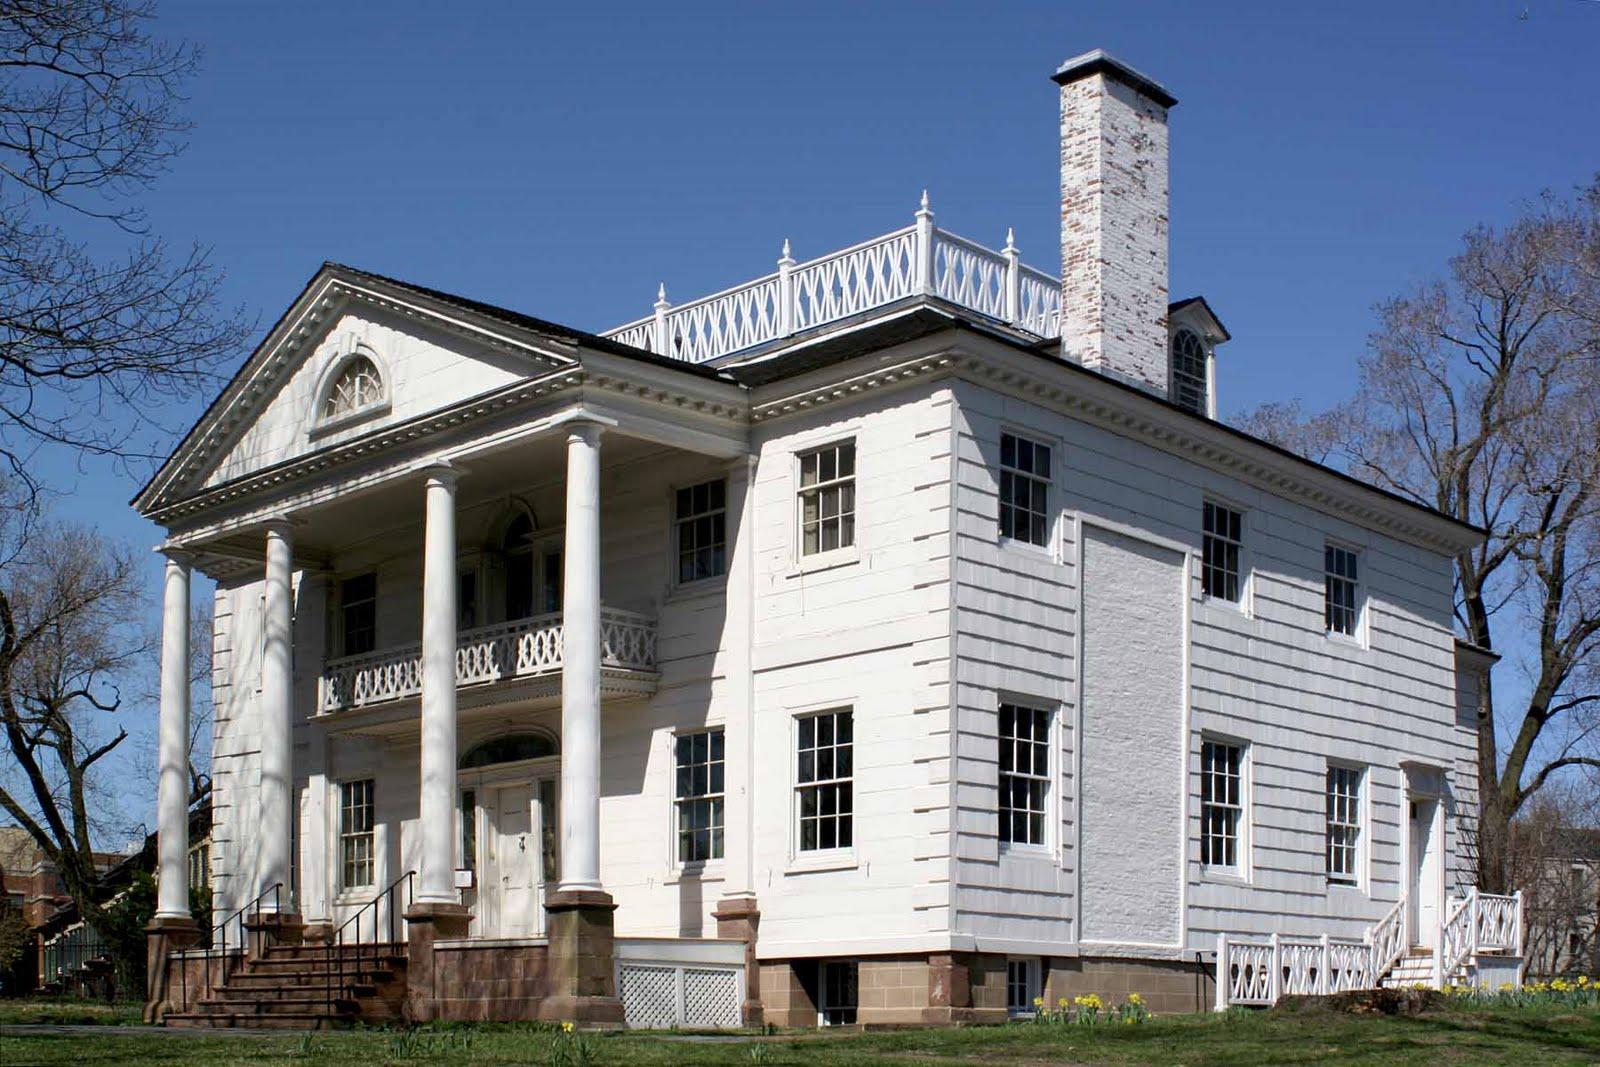 Arkansas Travelers New York Day 6 Morris Jumel Mansion